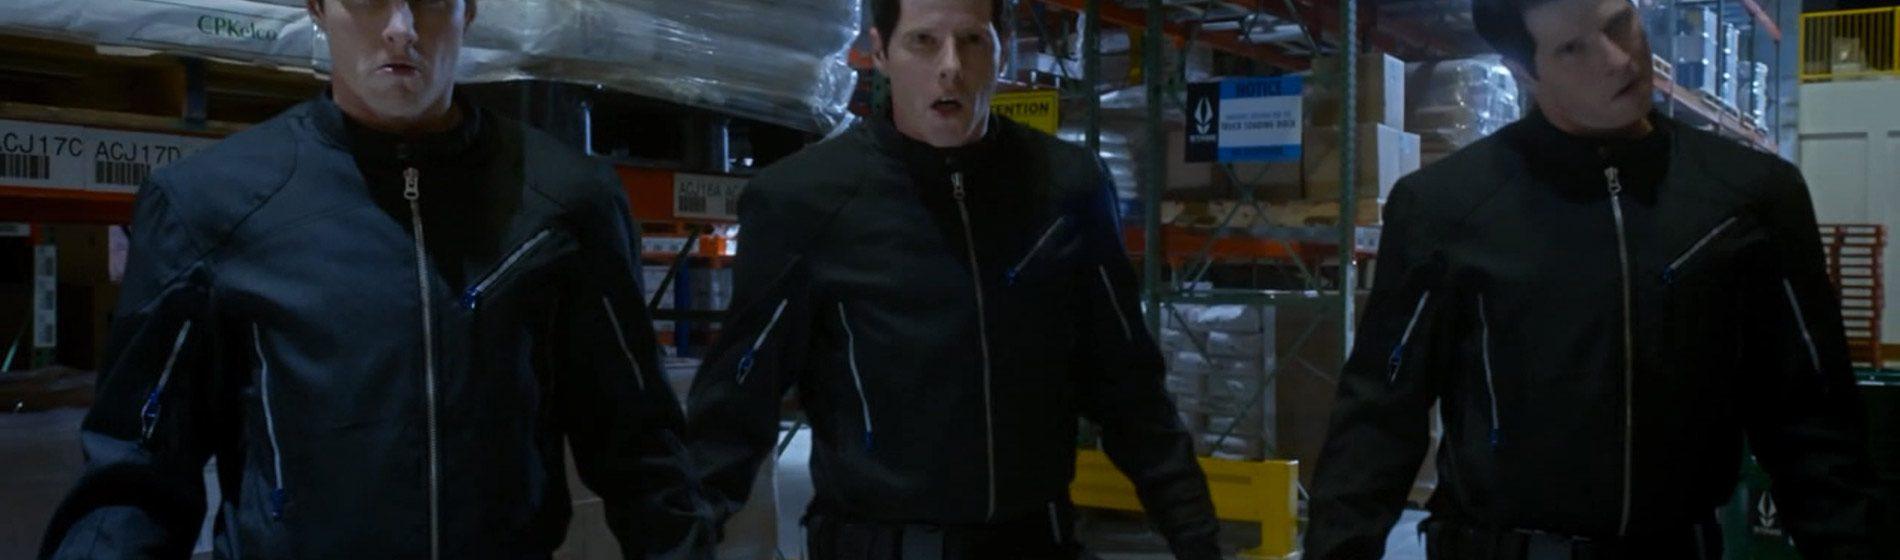 The Flash - Season 1 Episode 2 - Multiplex